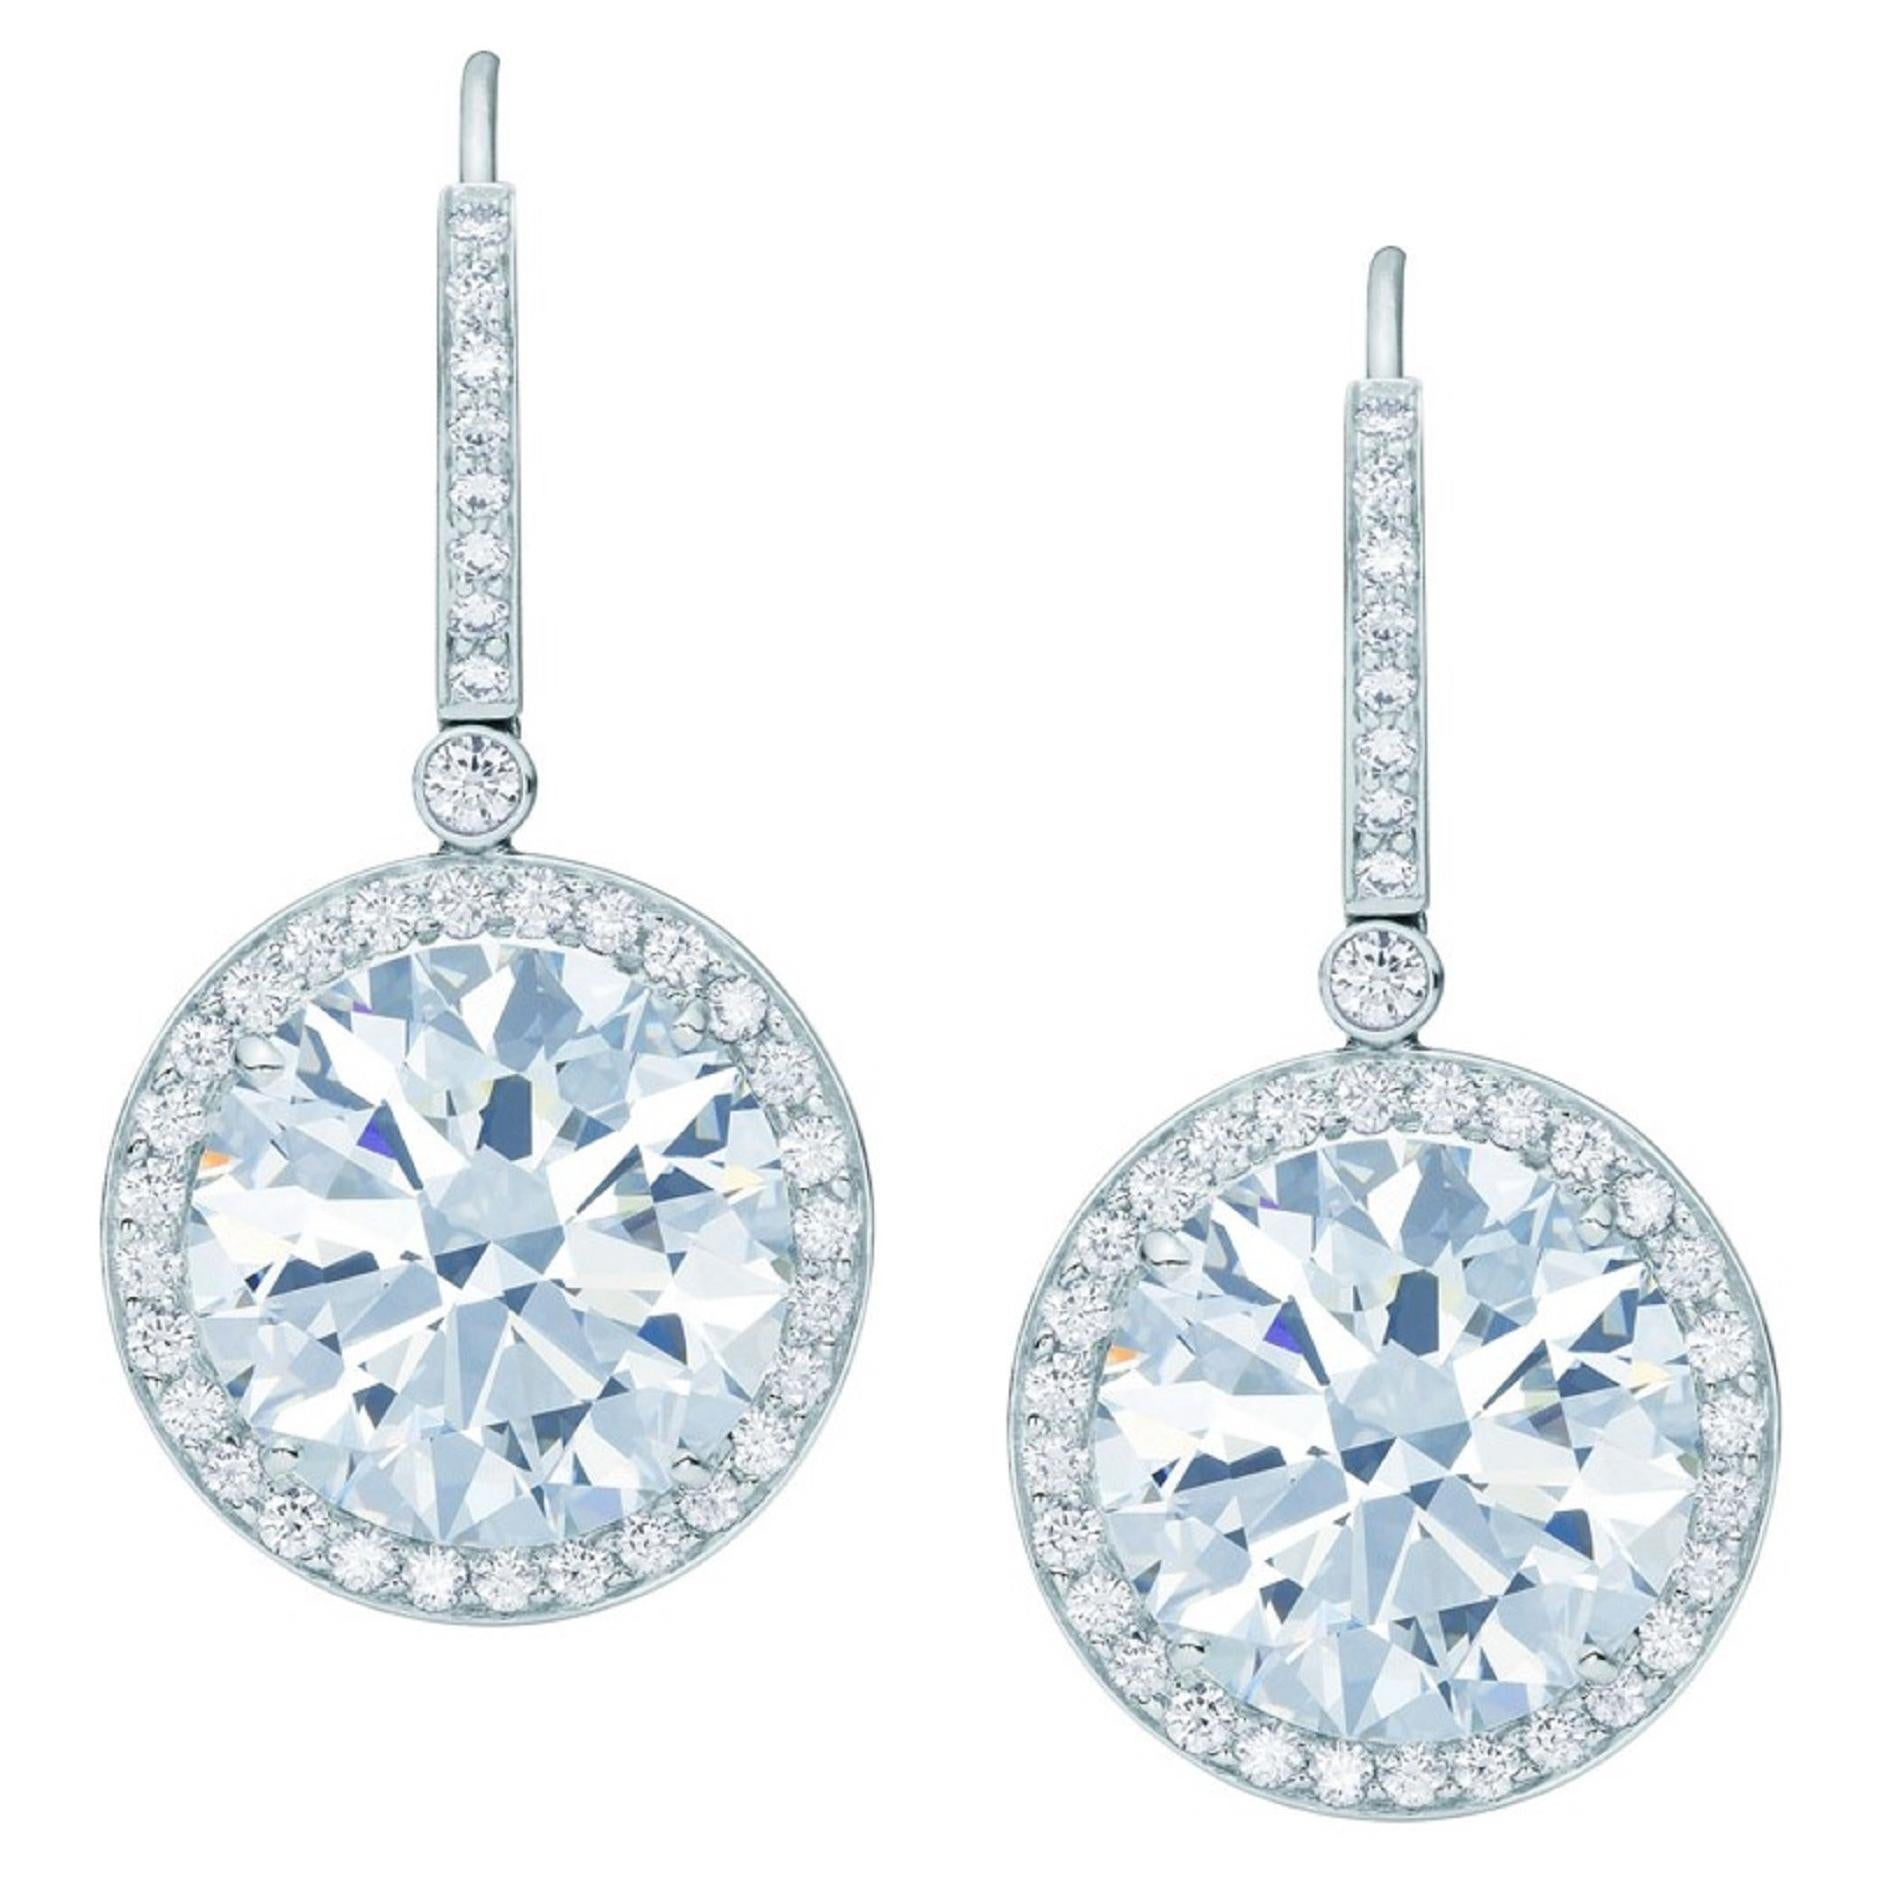 GIA 4 Carat Round Brilliant Cut Diamond Dangle Halo Earrings